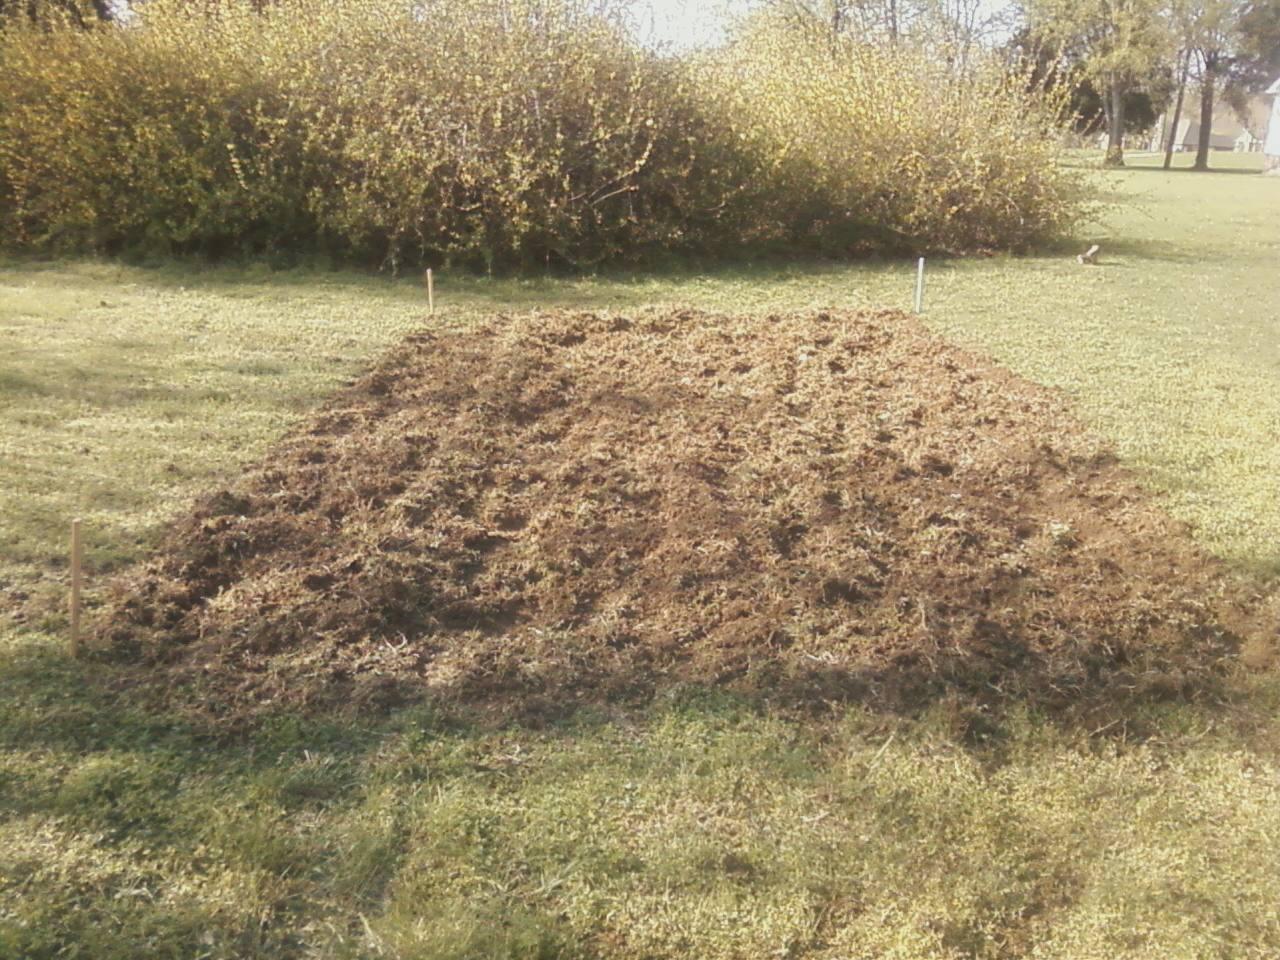 Newly plowed wannabe garden